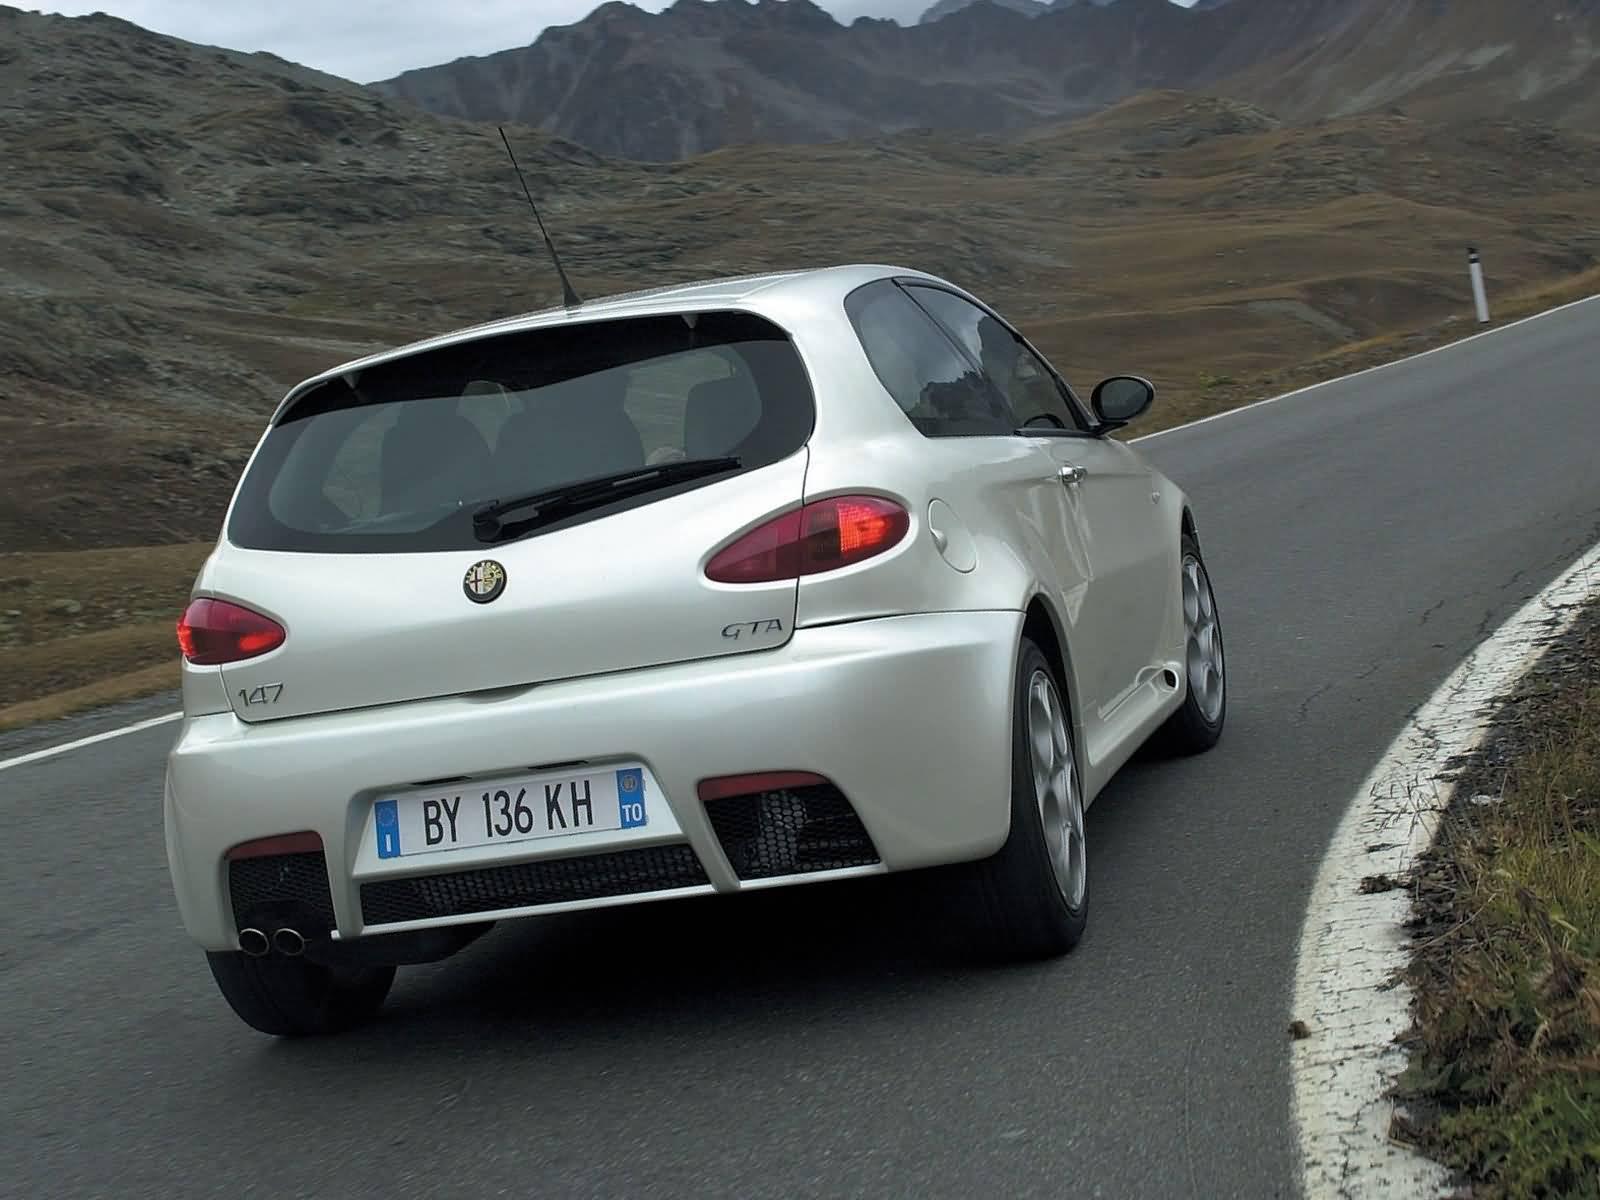 Back side view of beautiful White colour Alfa Romeo 147 GTA Car on the road